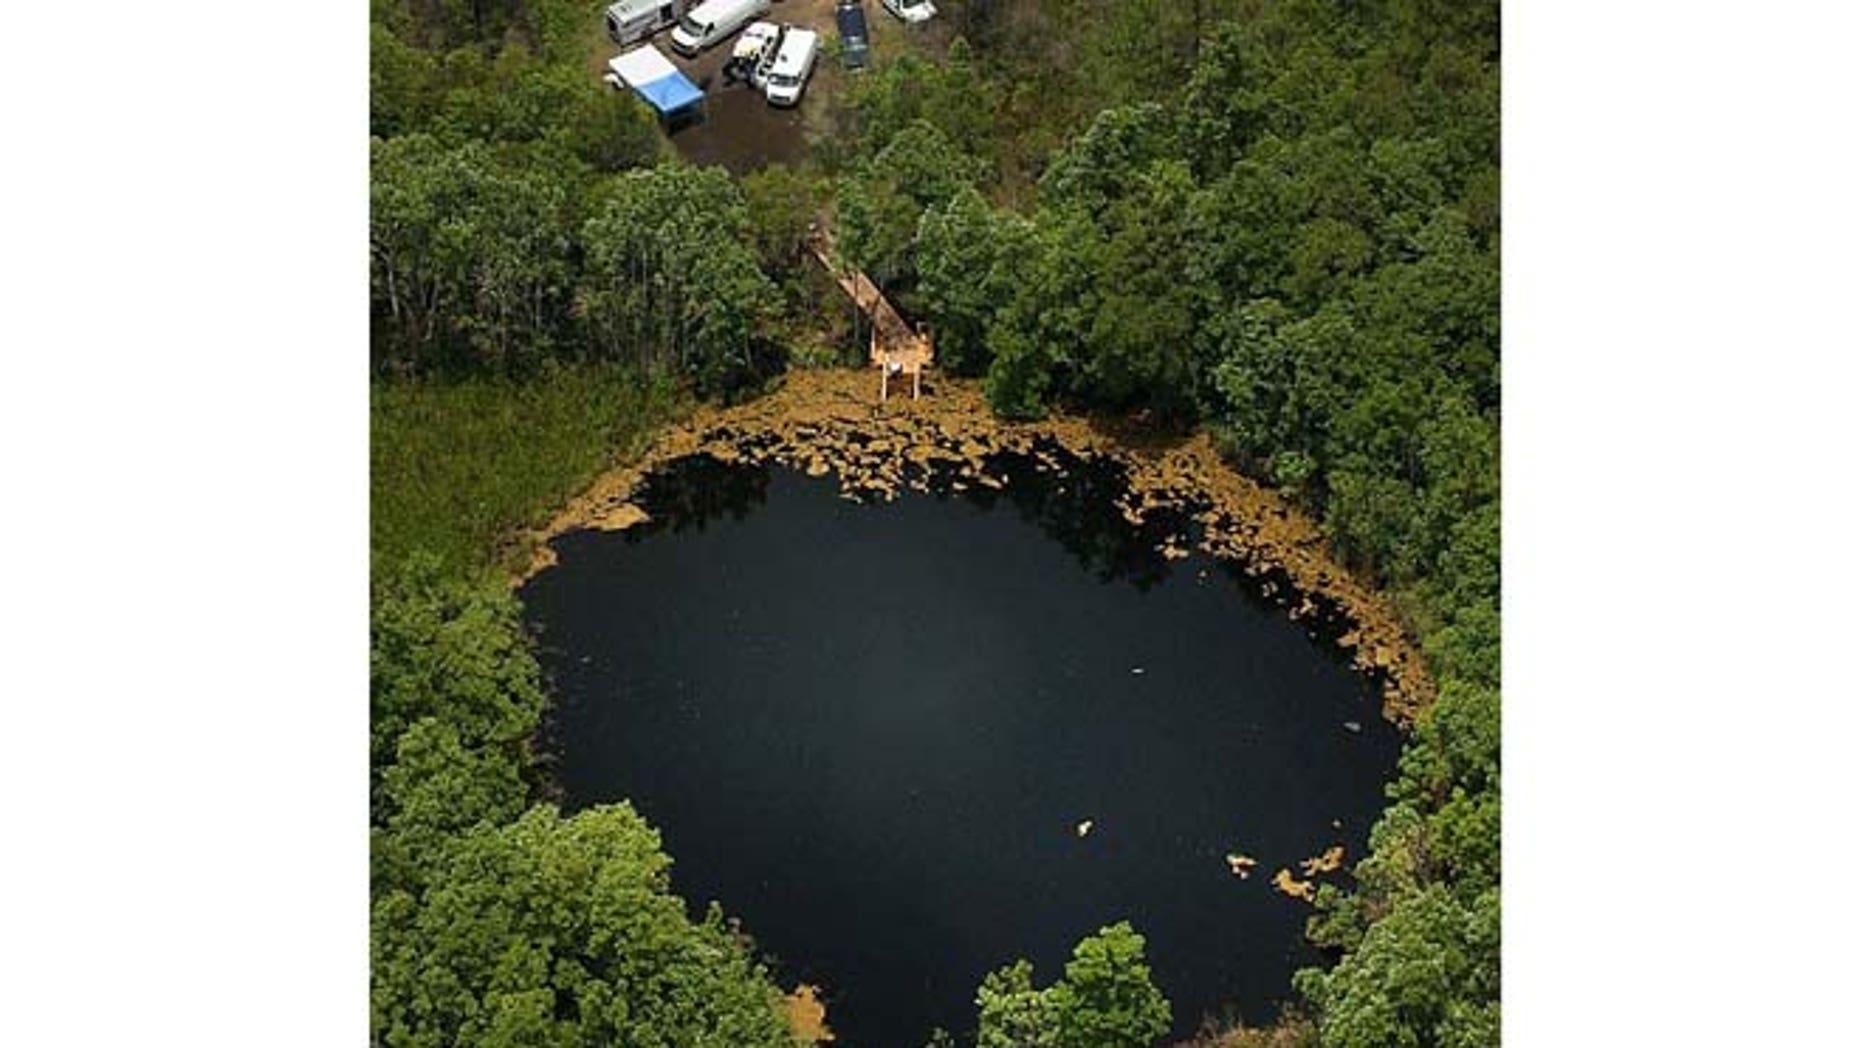 The Eagle's Nest dive site in Weeki Wachee, Fla.